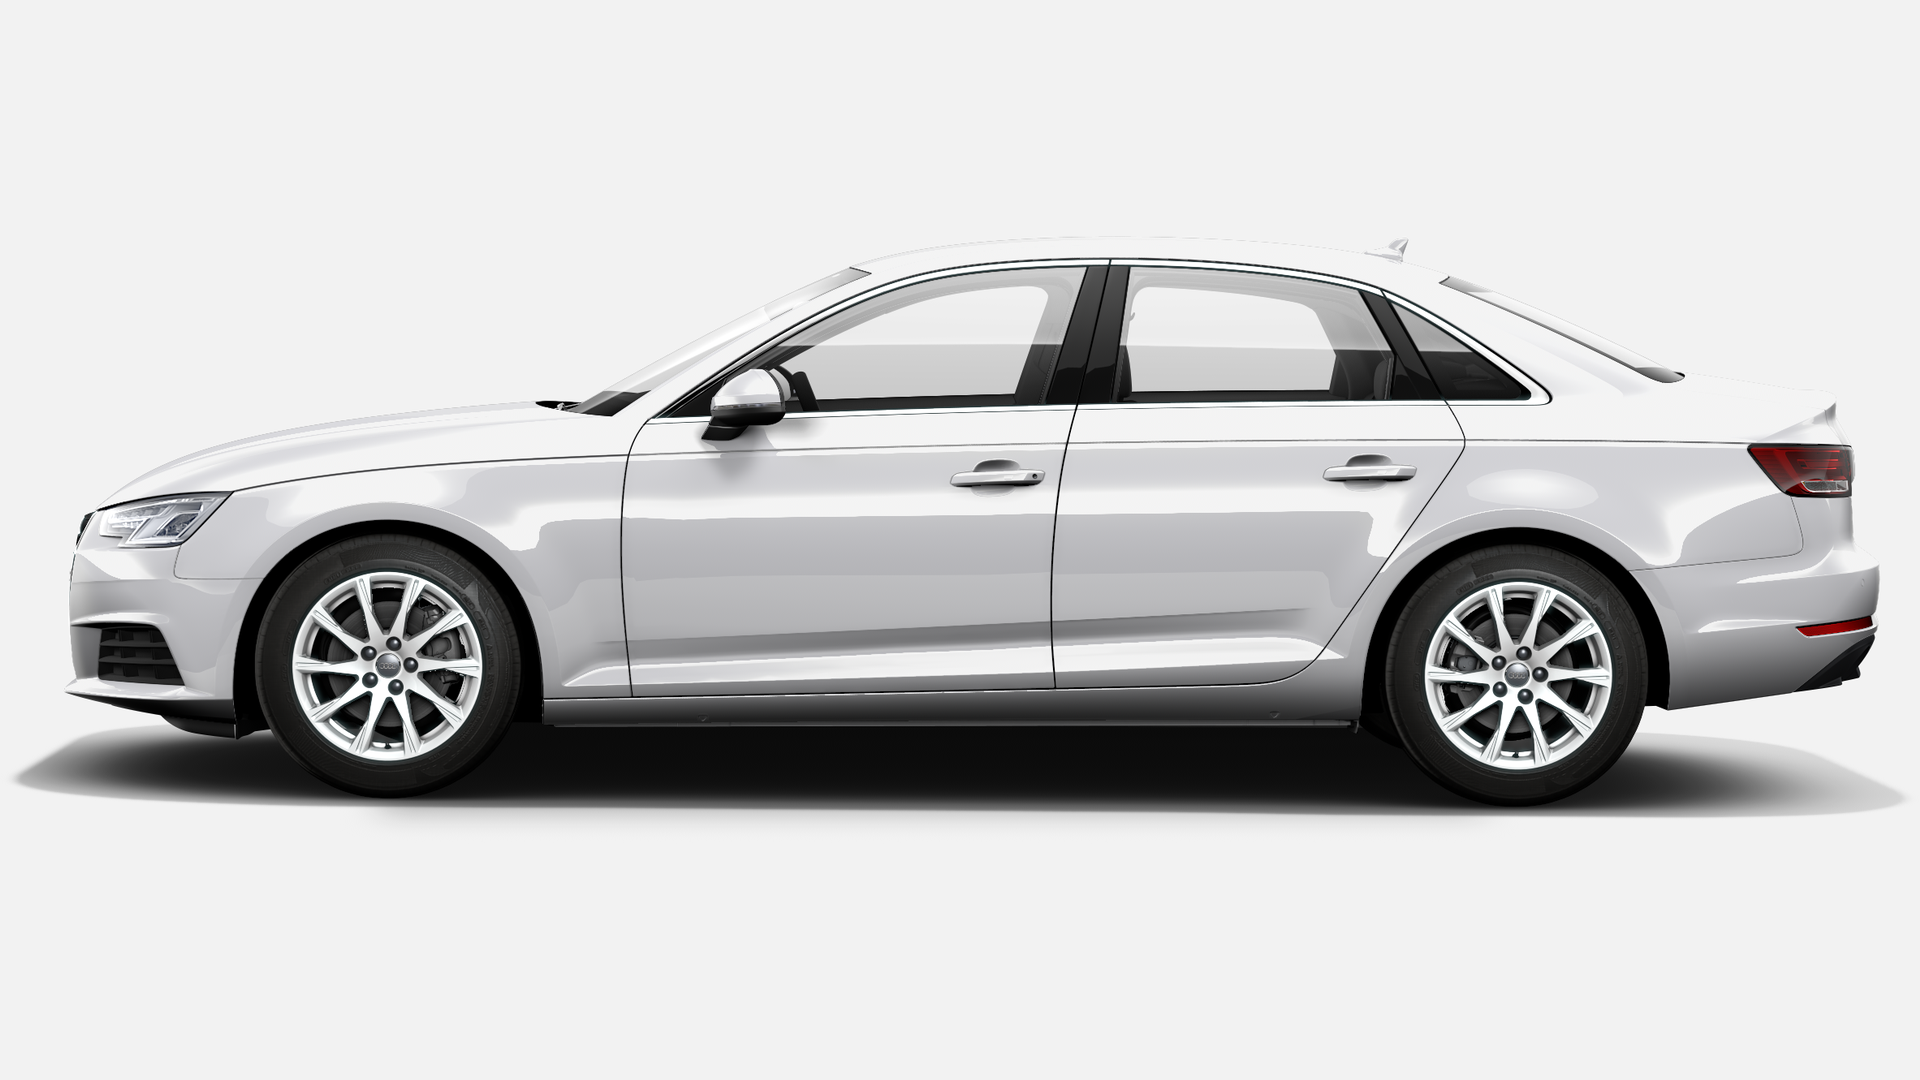 Vista Lateral izquierda de Audi A4 2.0 TDI ultra Advanced edition 110 kW (150 CV)